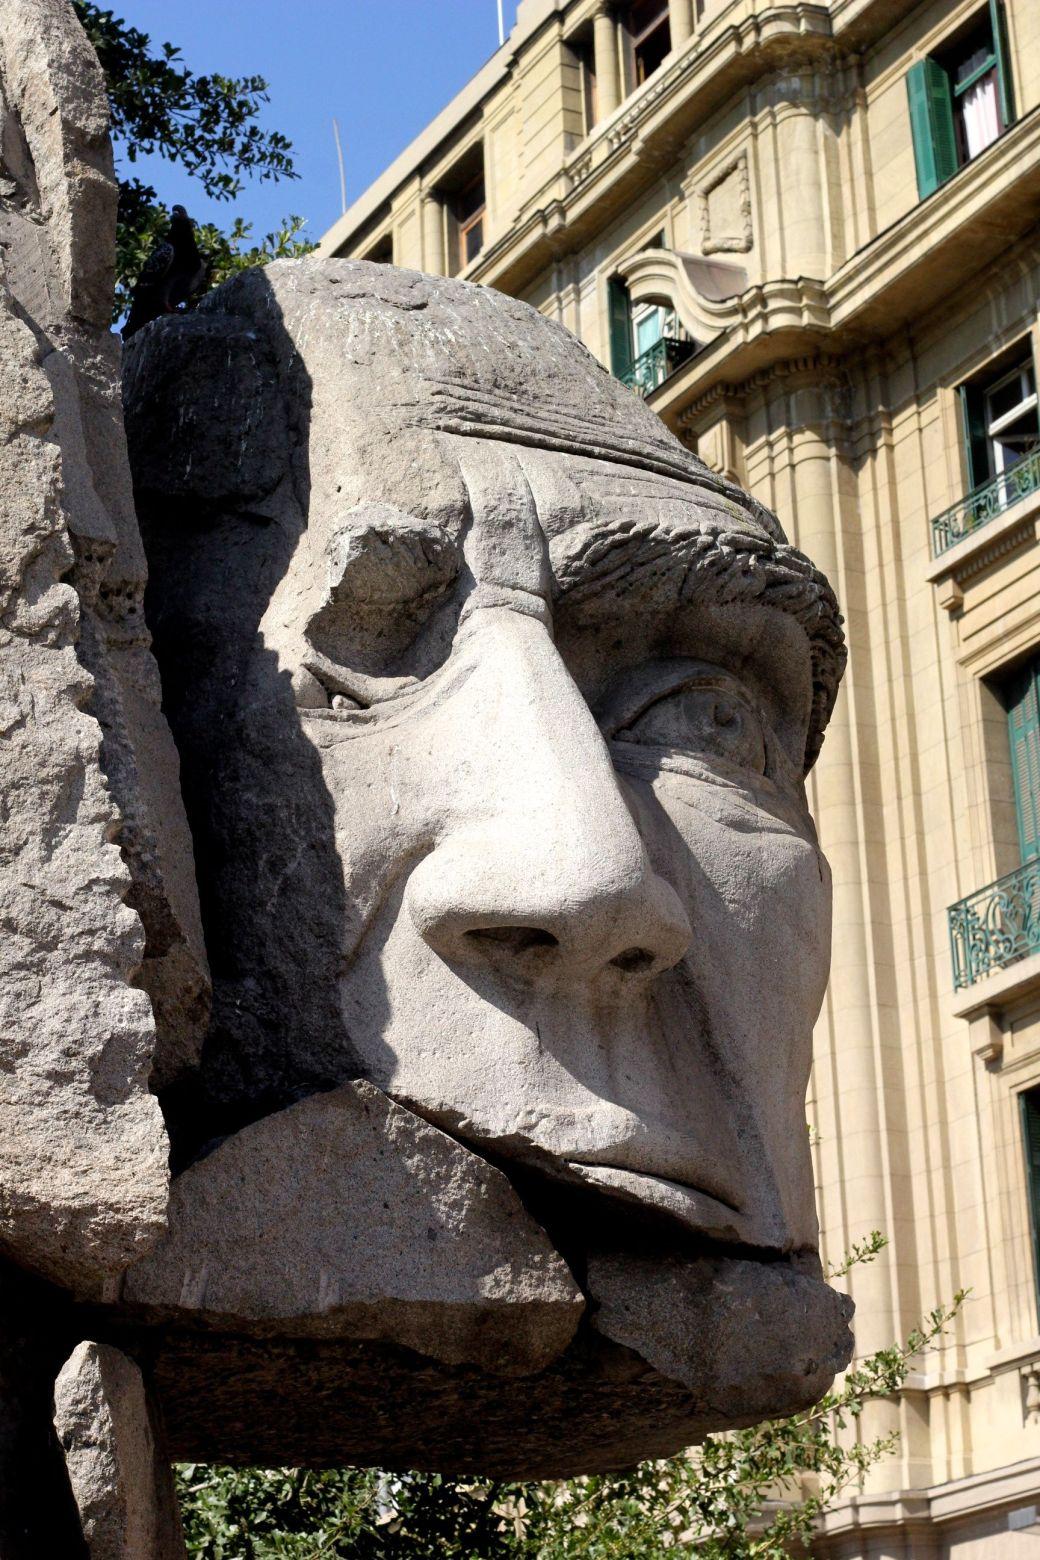 chile santiago plaza de armas statue face